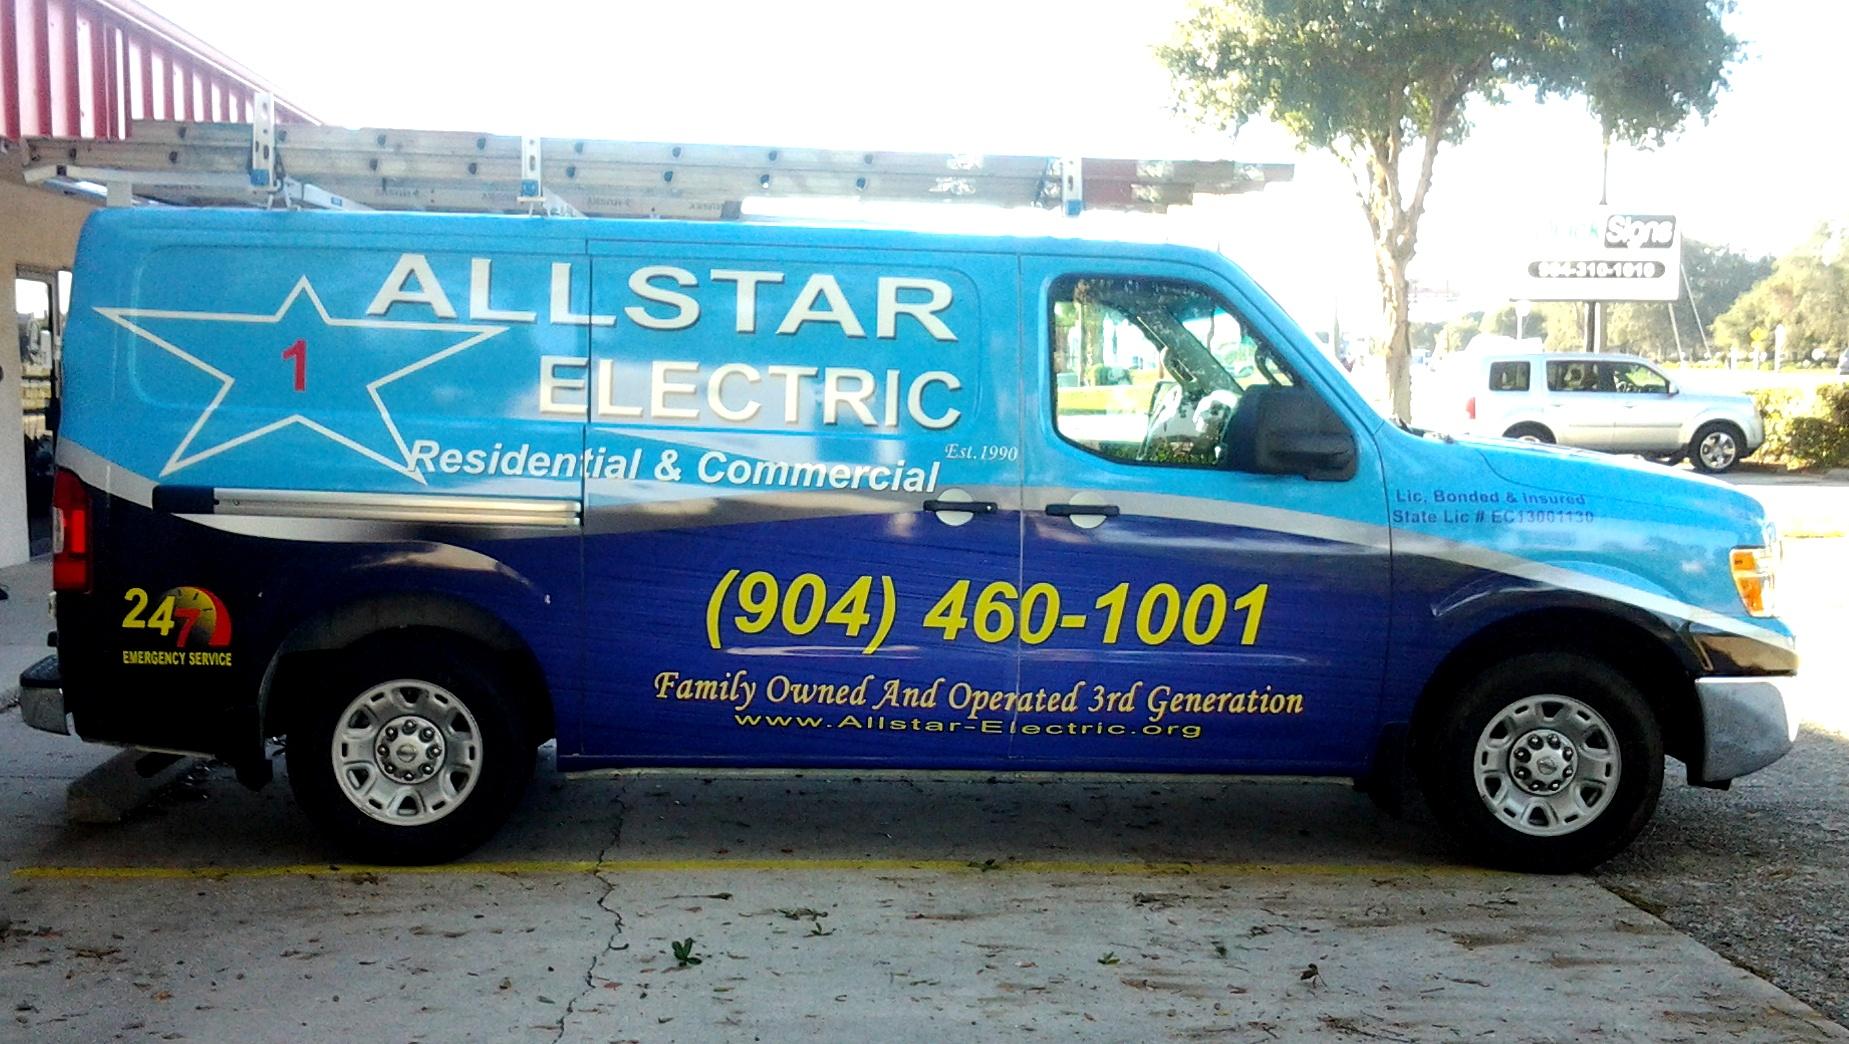 allstar electic van wrap